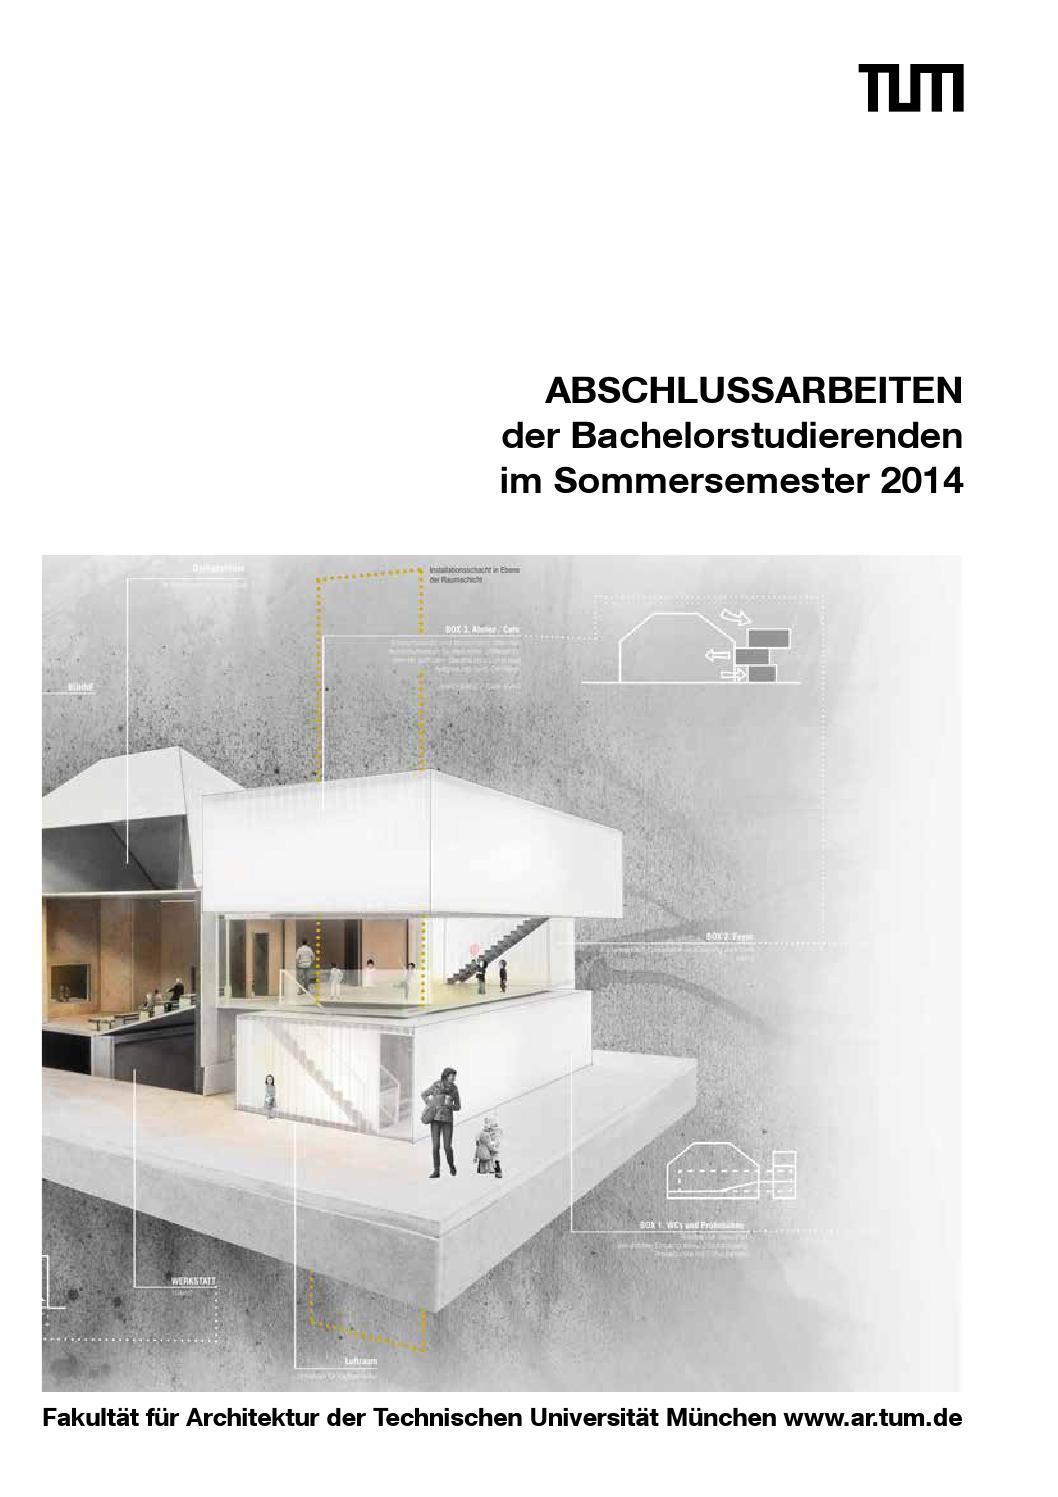 Sose2014bachelor by fakult t f r architektur tu m nchen for Masterarbeit architektur